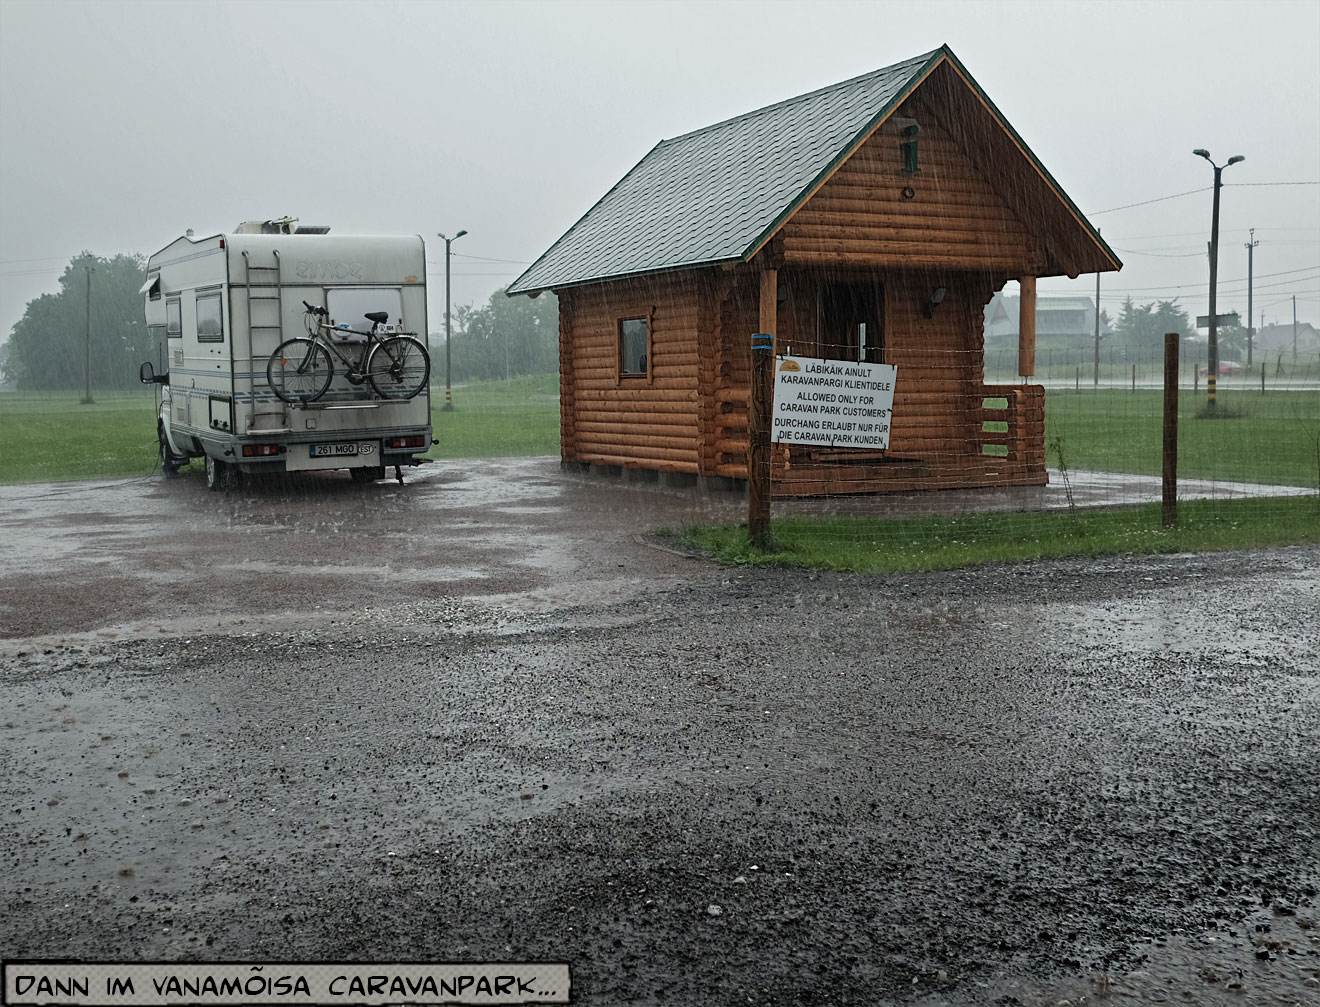 Regen auf dem Campingplatz